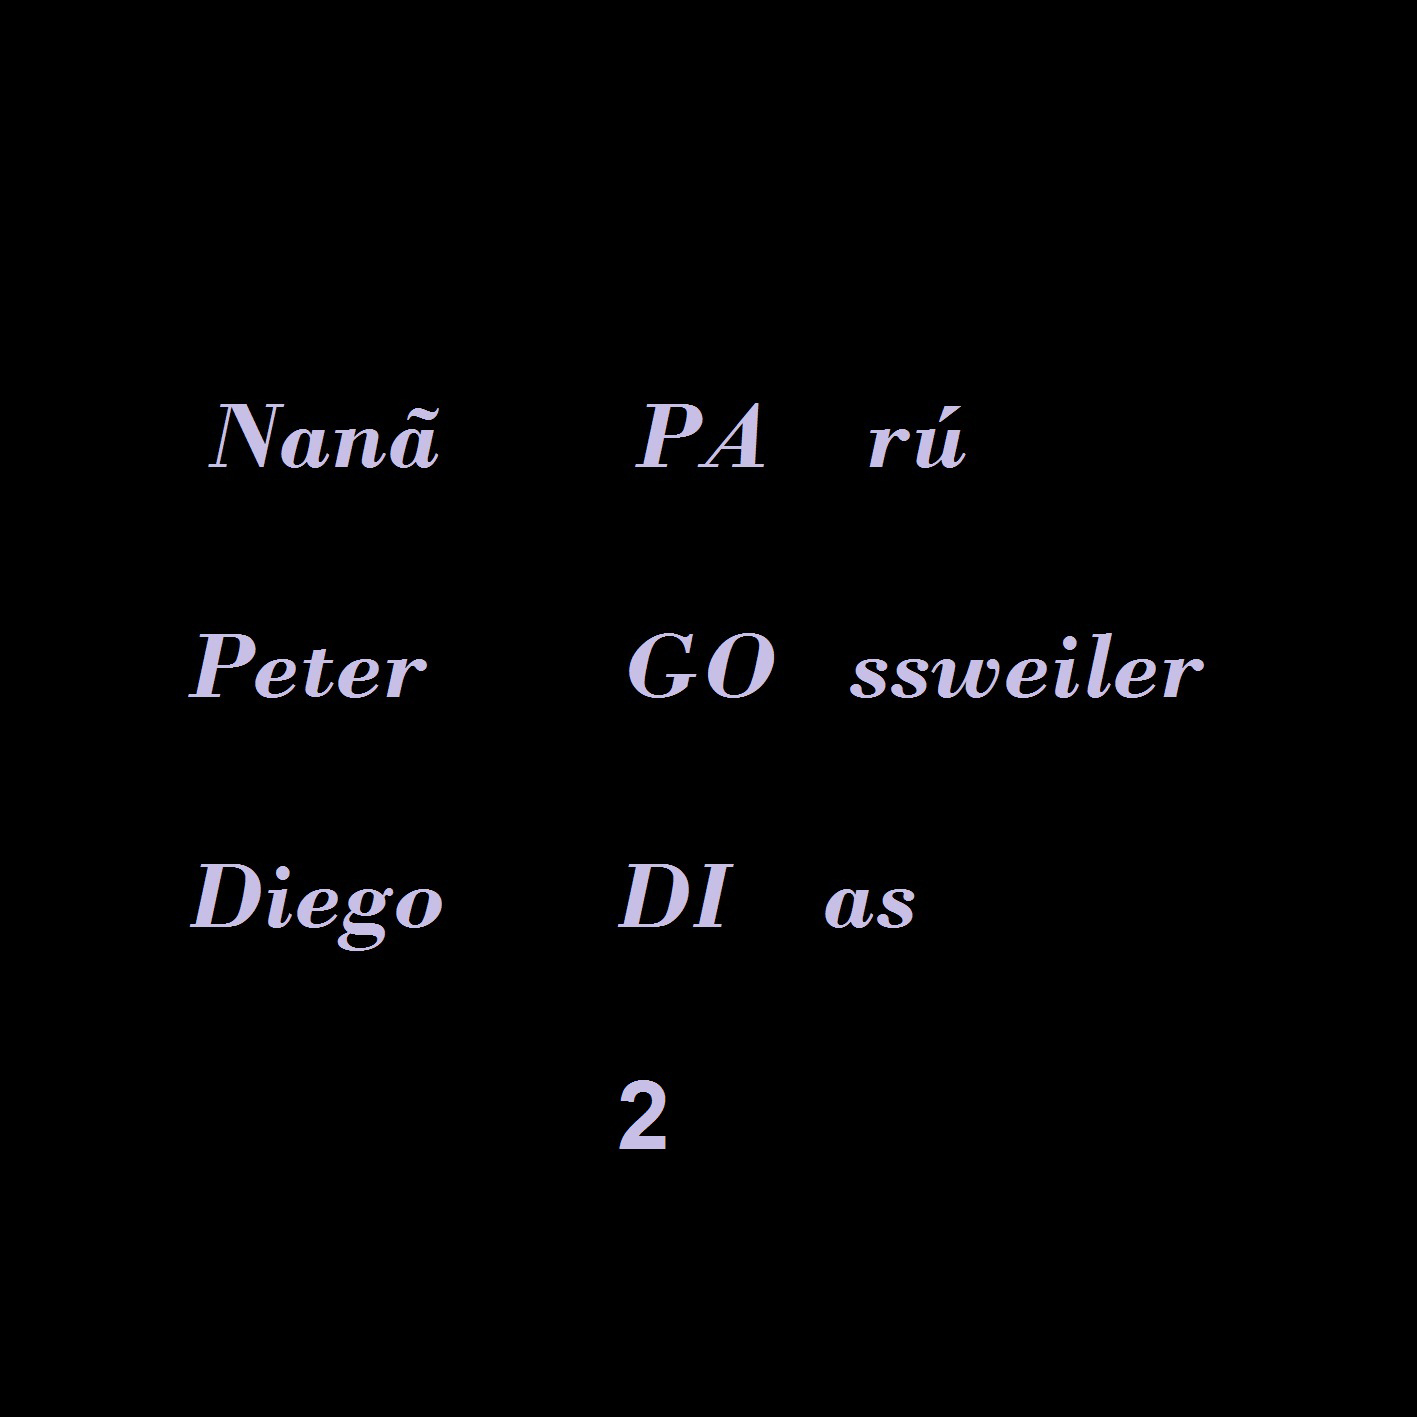 MSRCD 028 - Nanã Parú, Peter Gossweiler, Diego Dias - PAGODI 2